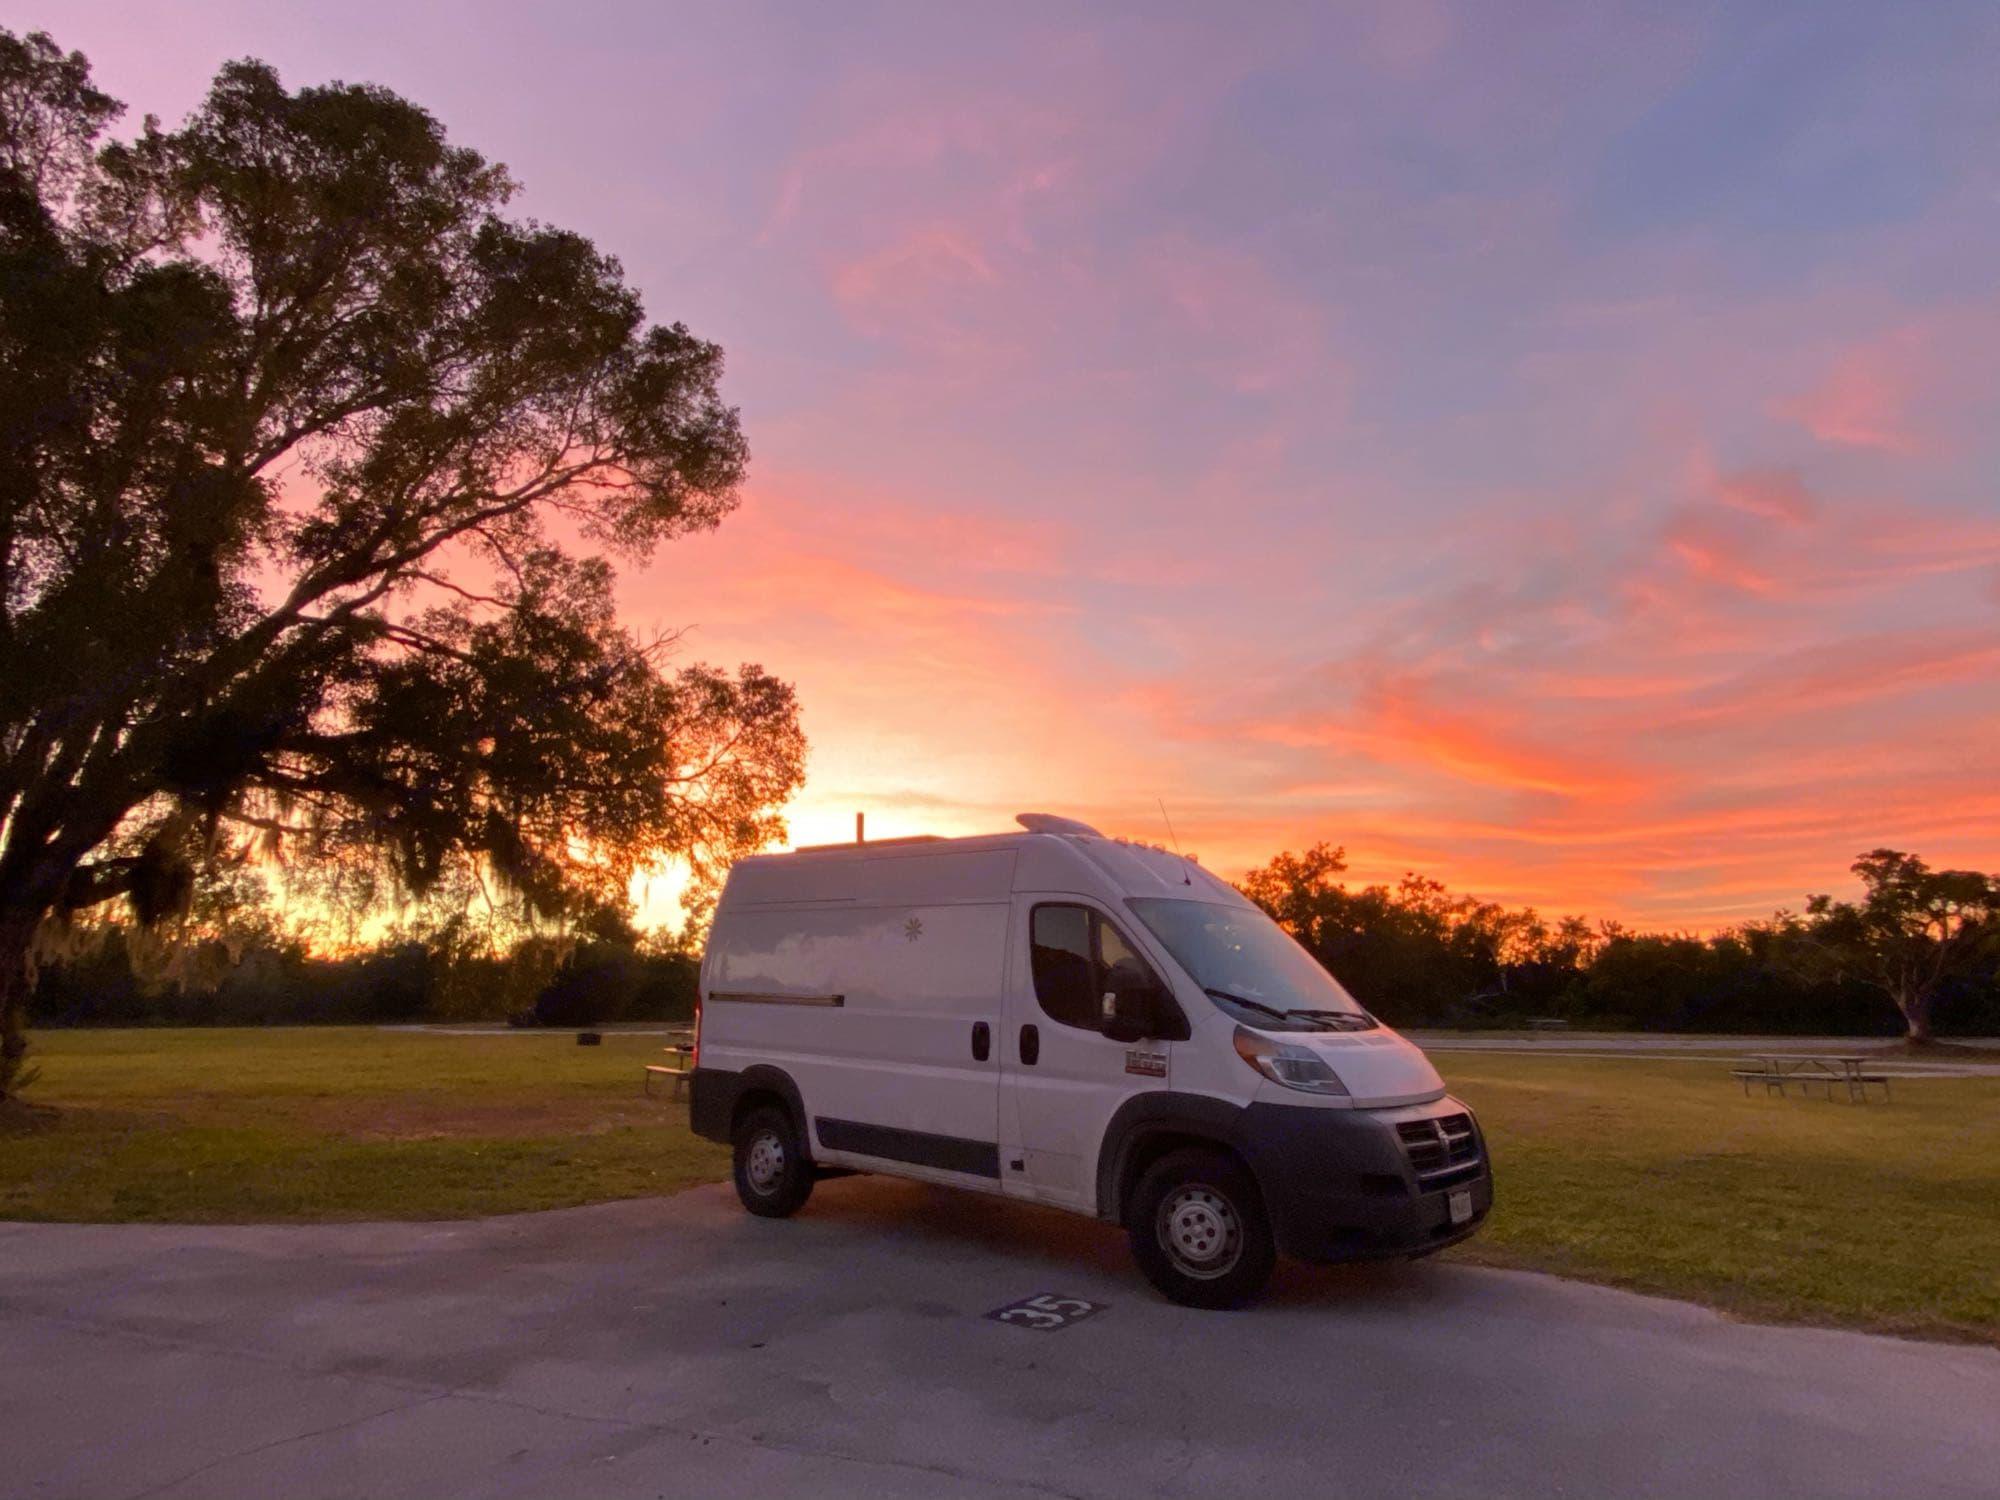 Everglades National Park, FL. RAM Promaster 1500 136WB 2016